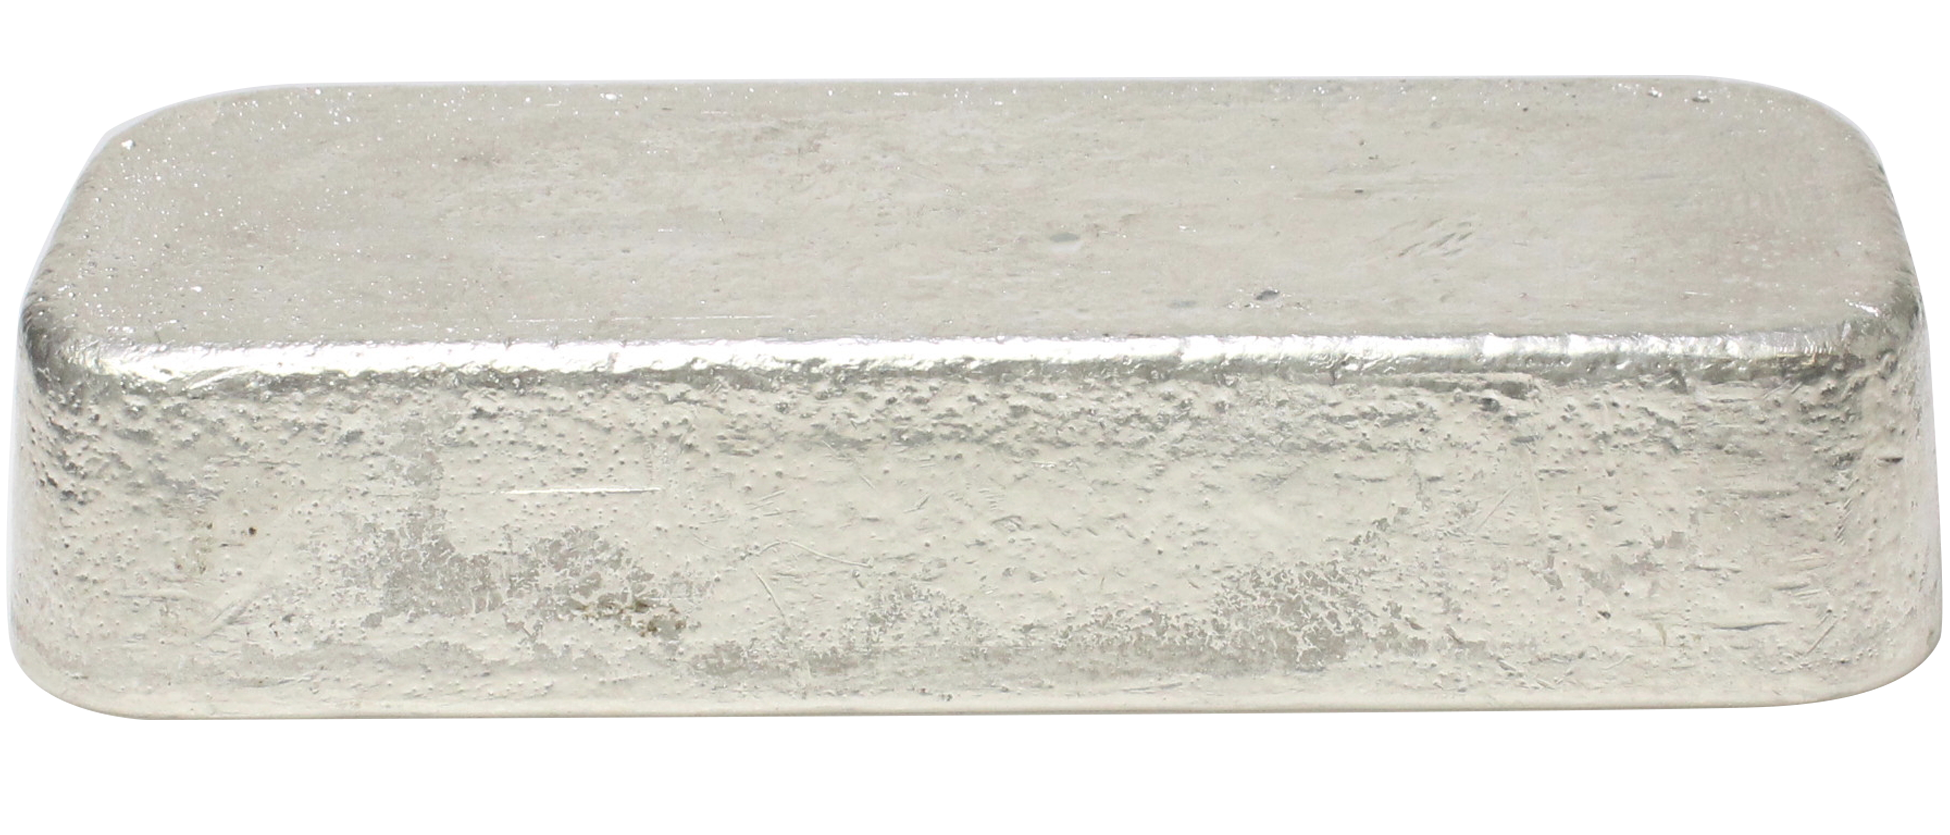 100oz silver bar, front